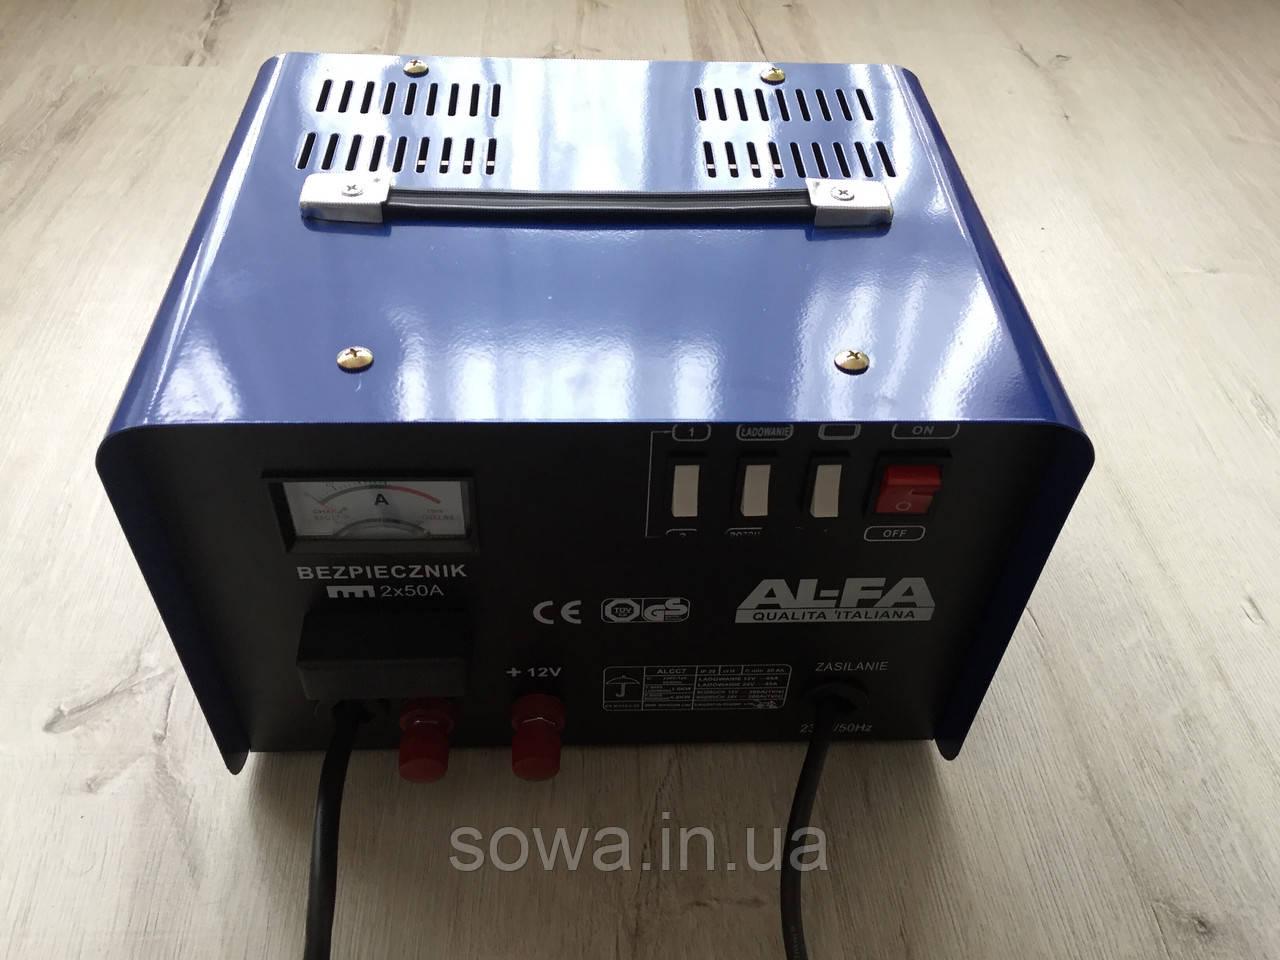 ✔️ Пуско зарядний пристрій AL-FA PRO-LINA ALCC7 ( 12В / 24В )